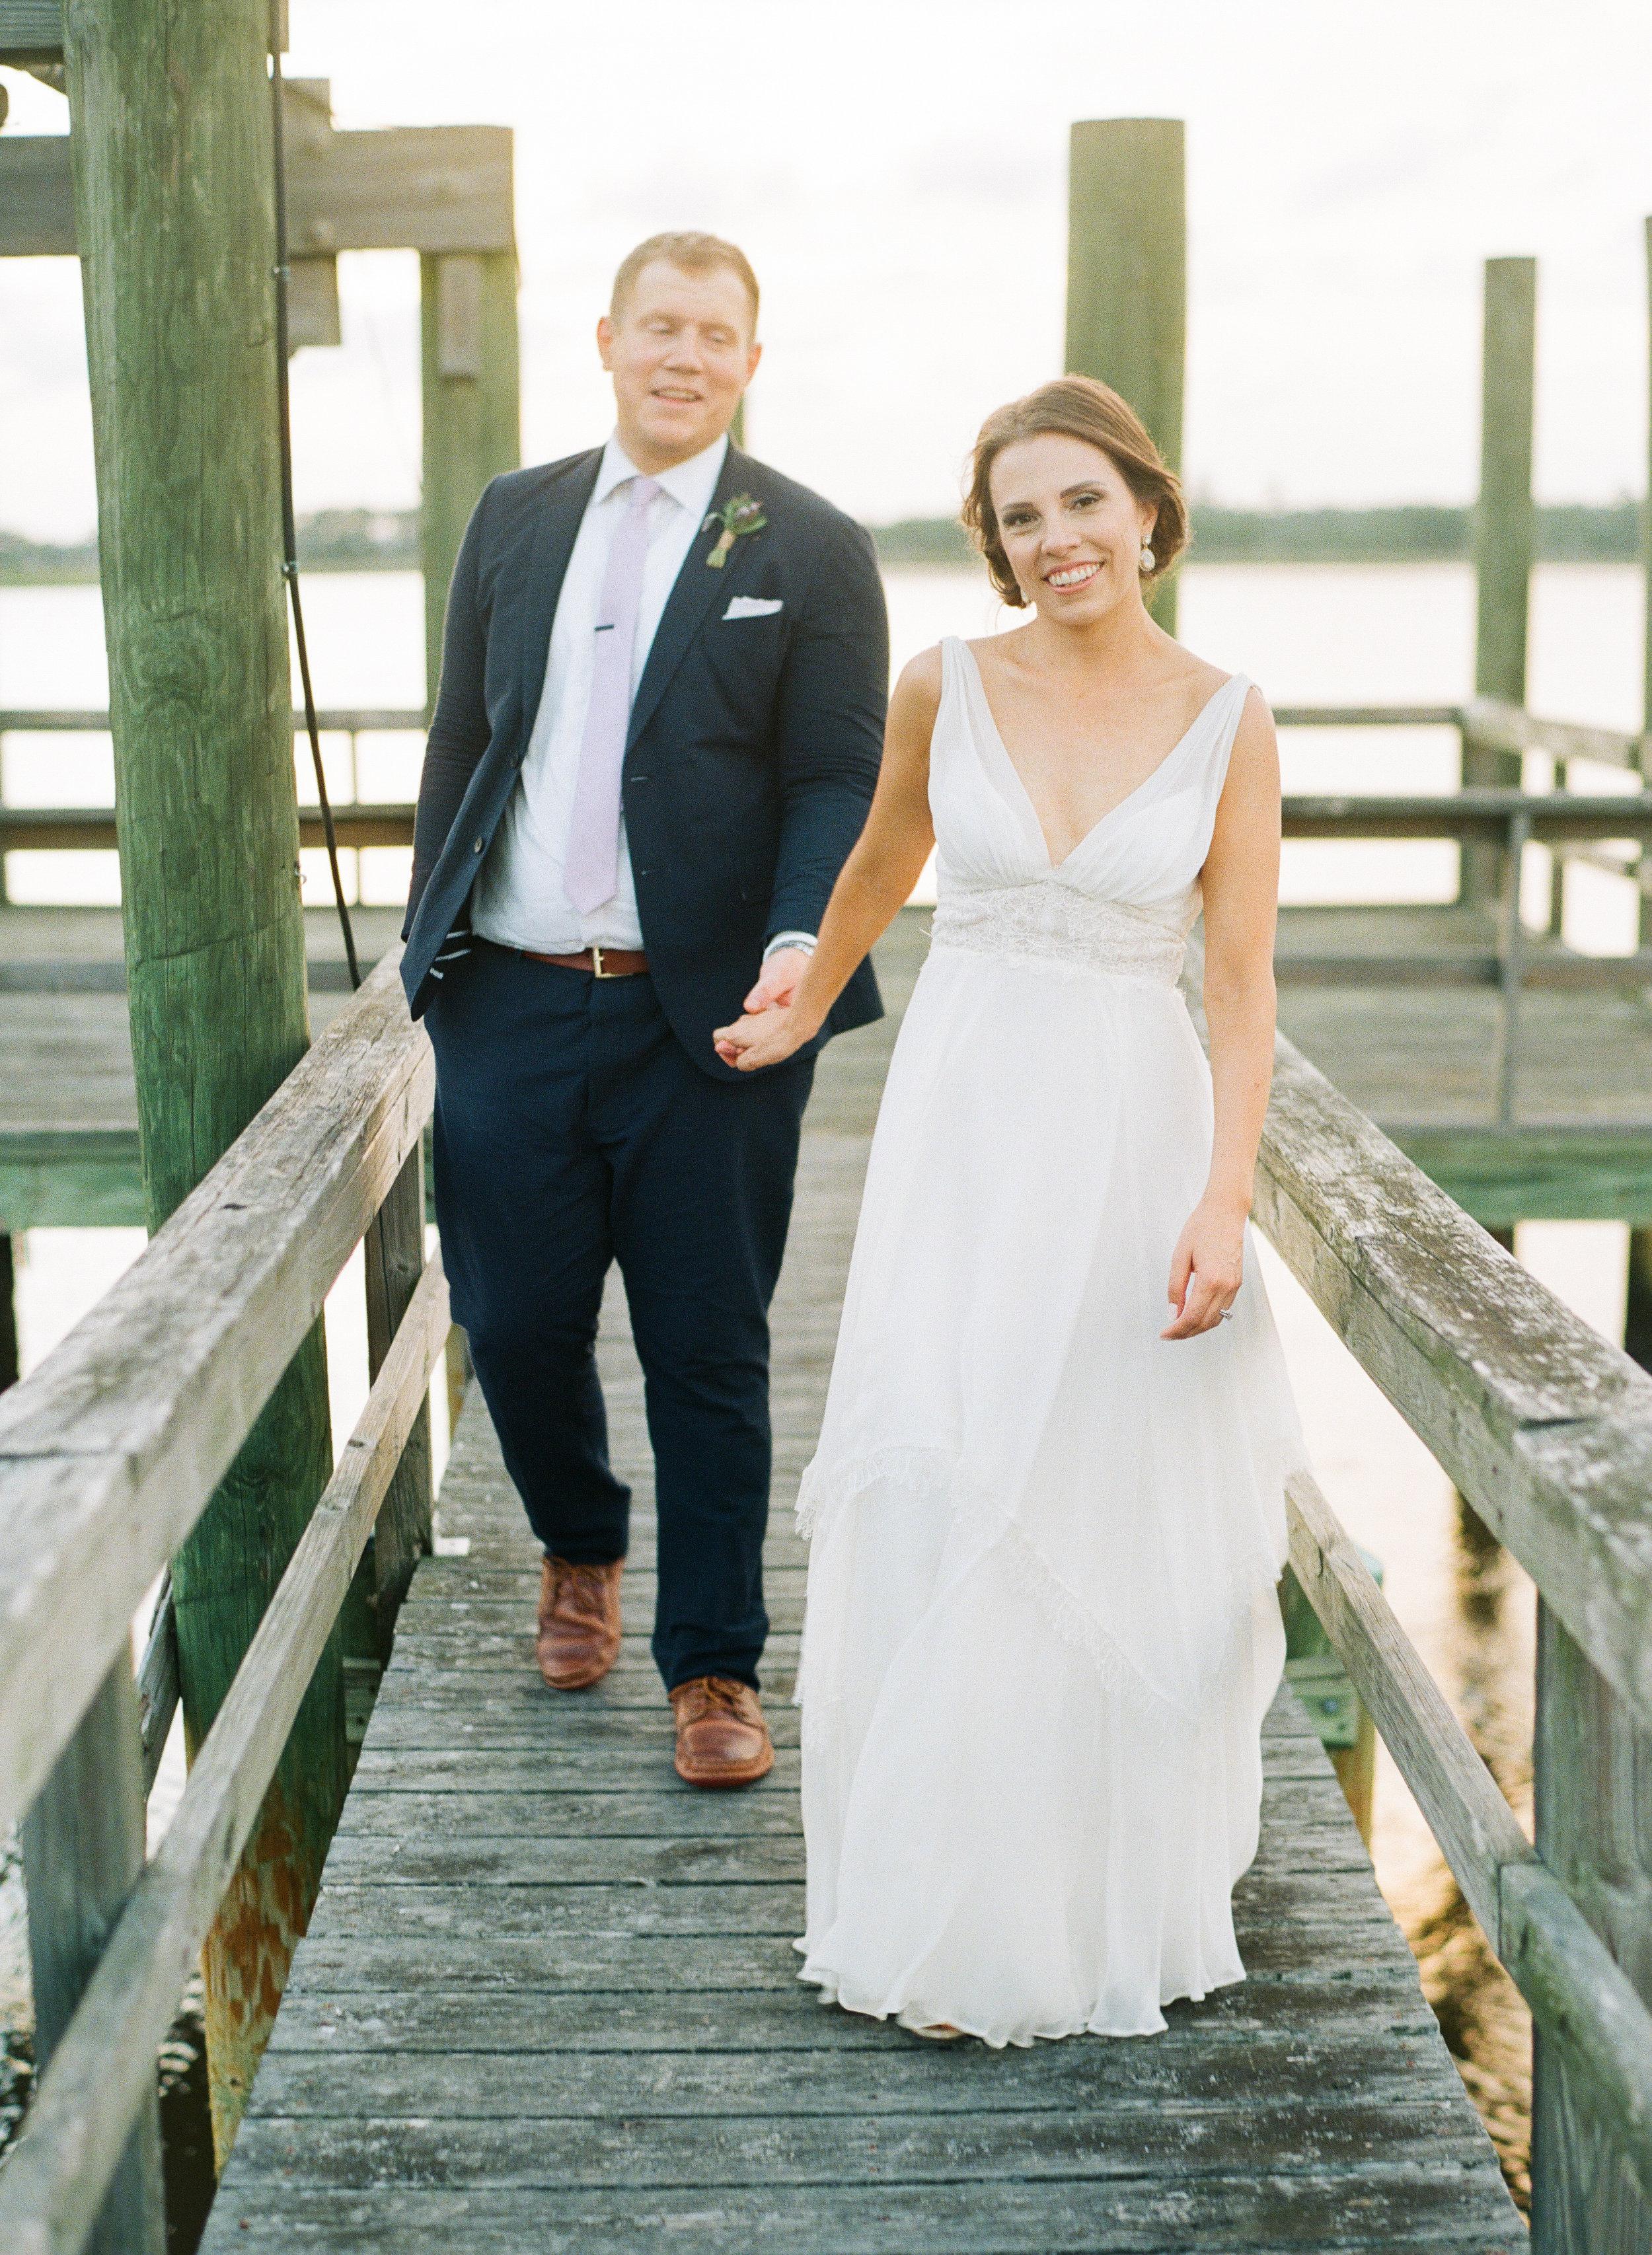 Wedding portraits on the dock at The Island House on Johns Island SC  //  Charleston wedding photos by Lauren Jonas Photography